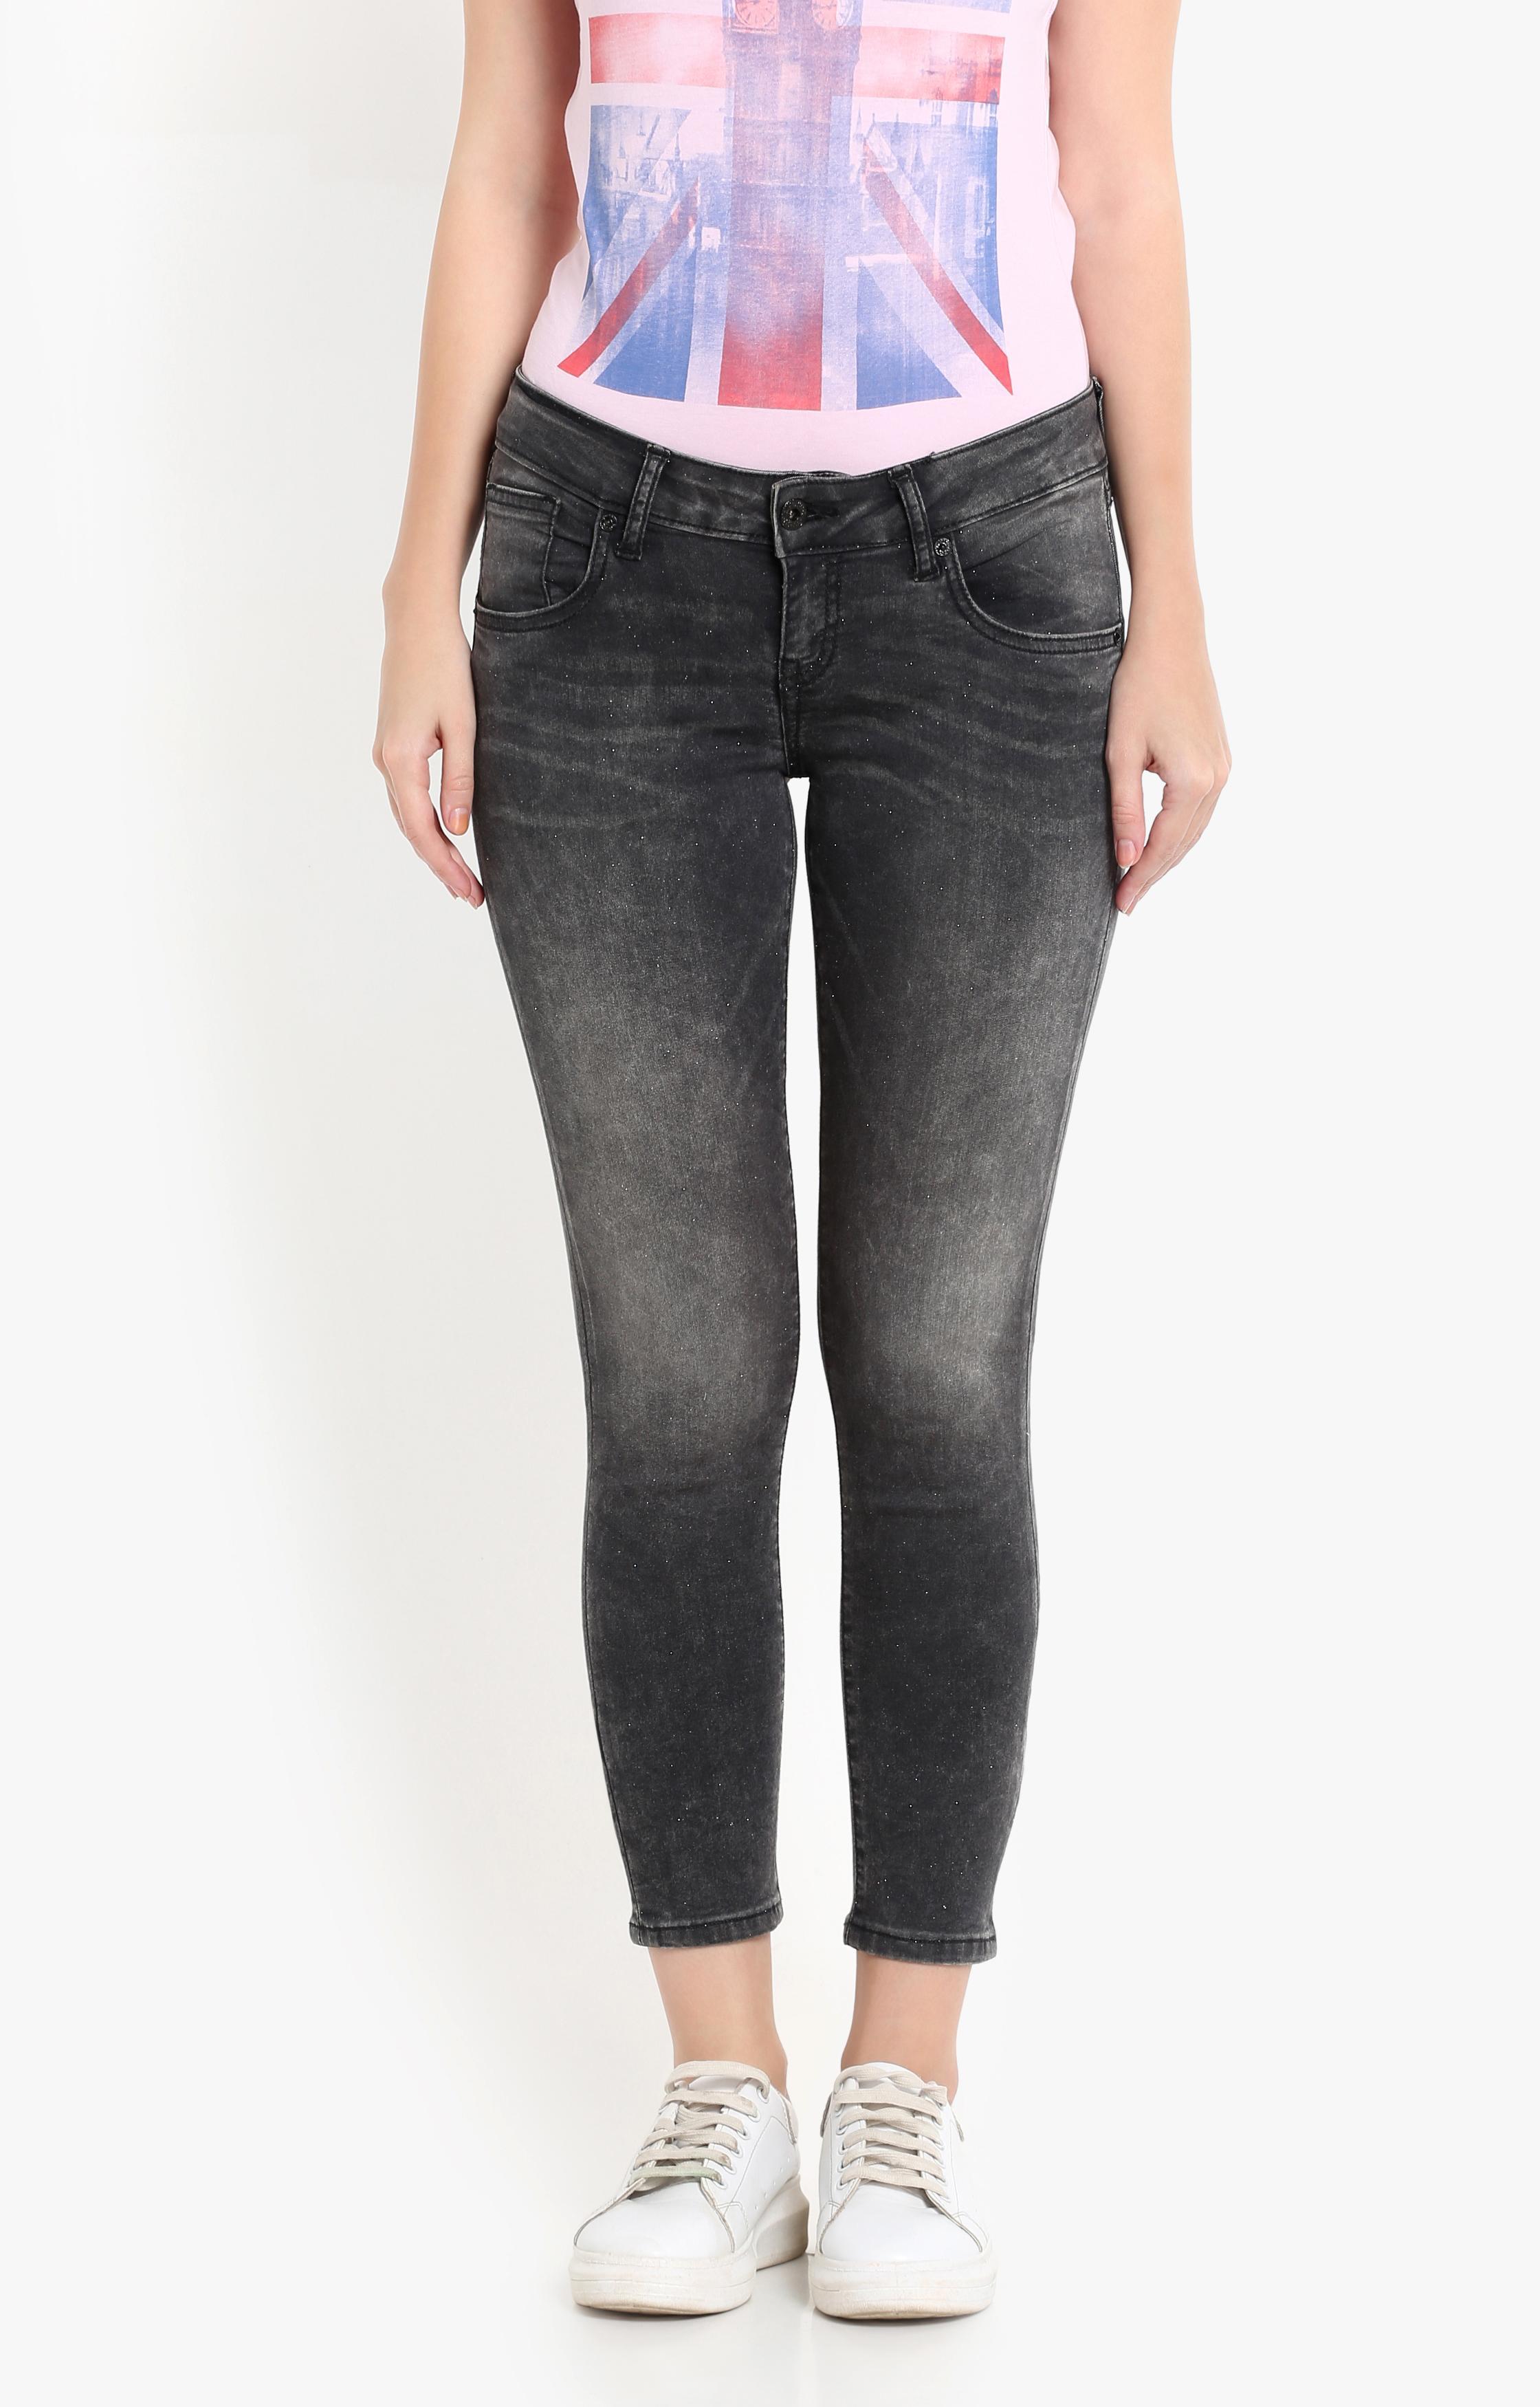 Pepe Jeans | Black Solid Capri Jeans